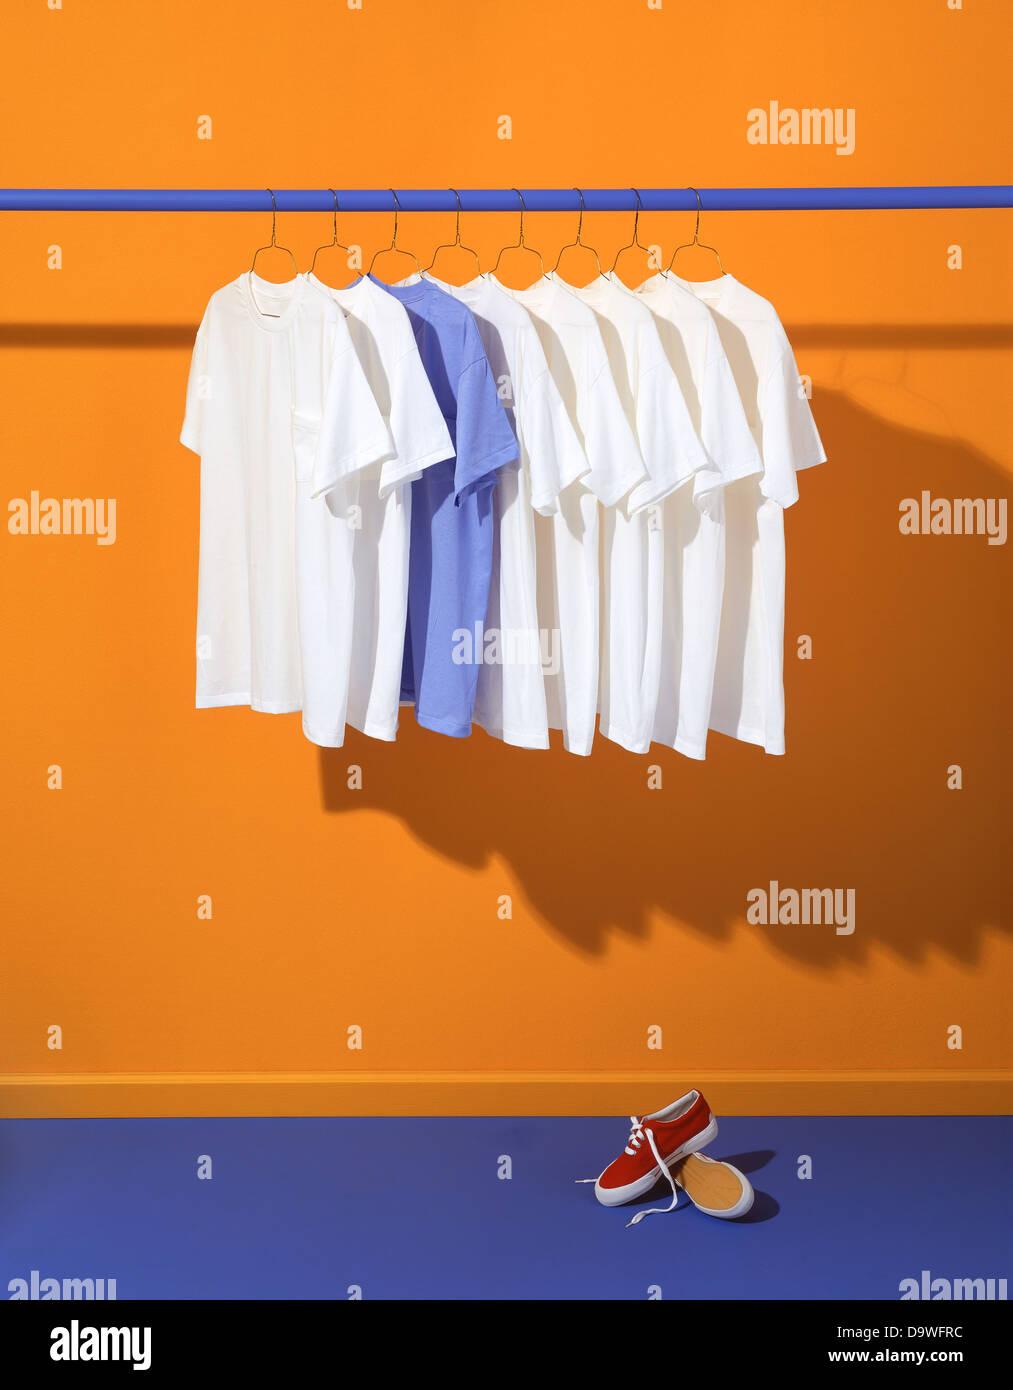 clothe rack - Stock Image